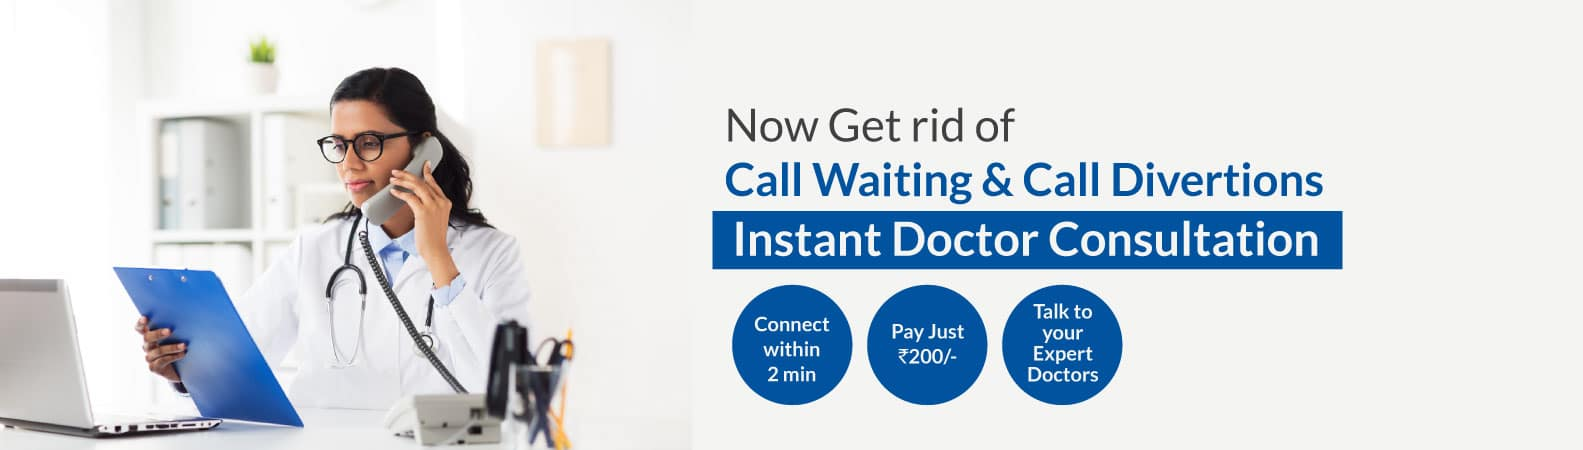 instant doctor online consultation